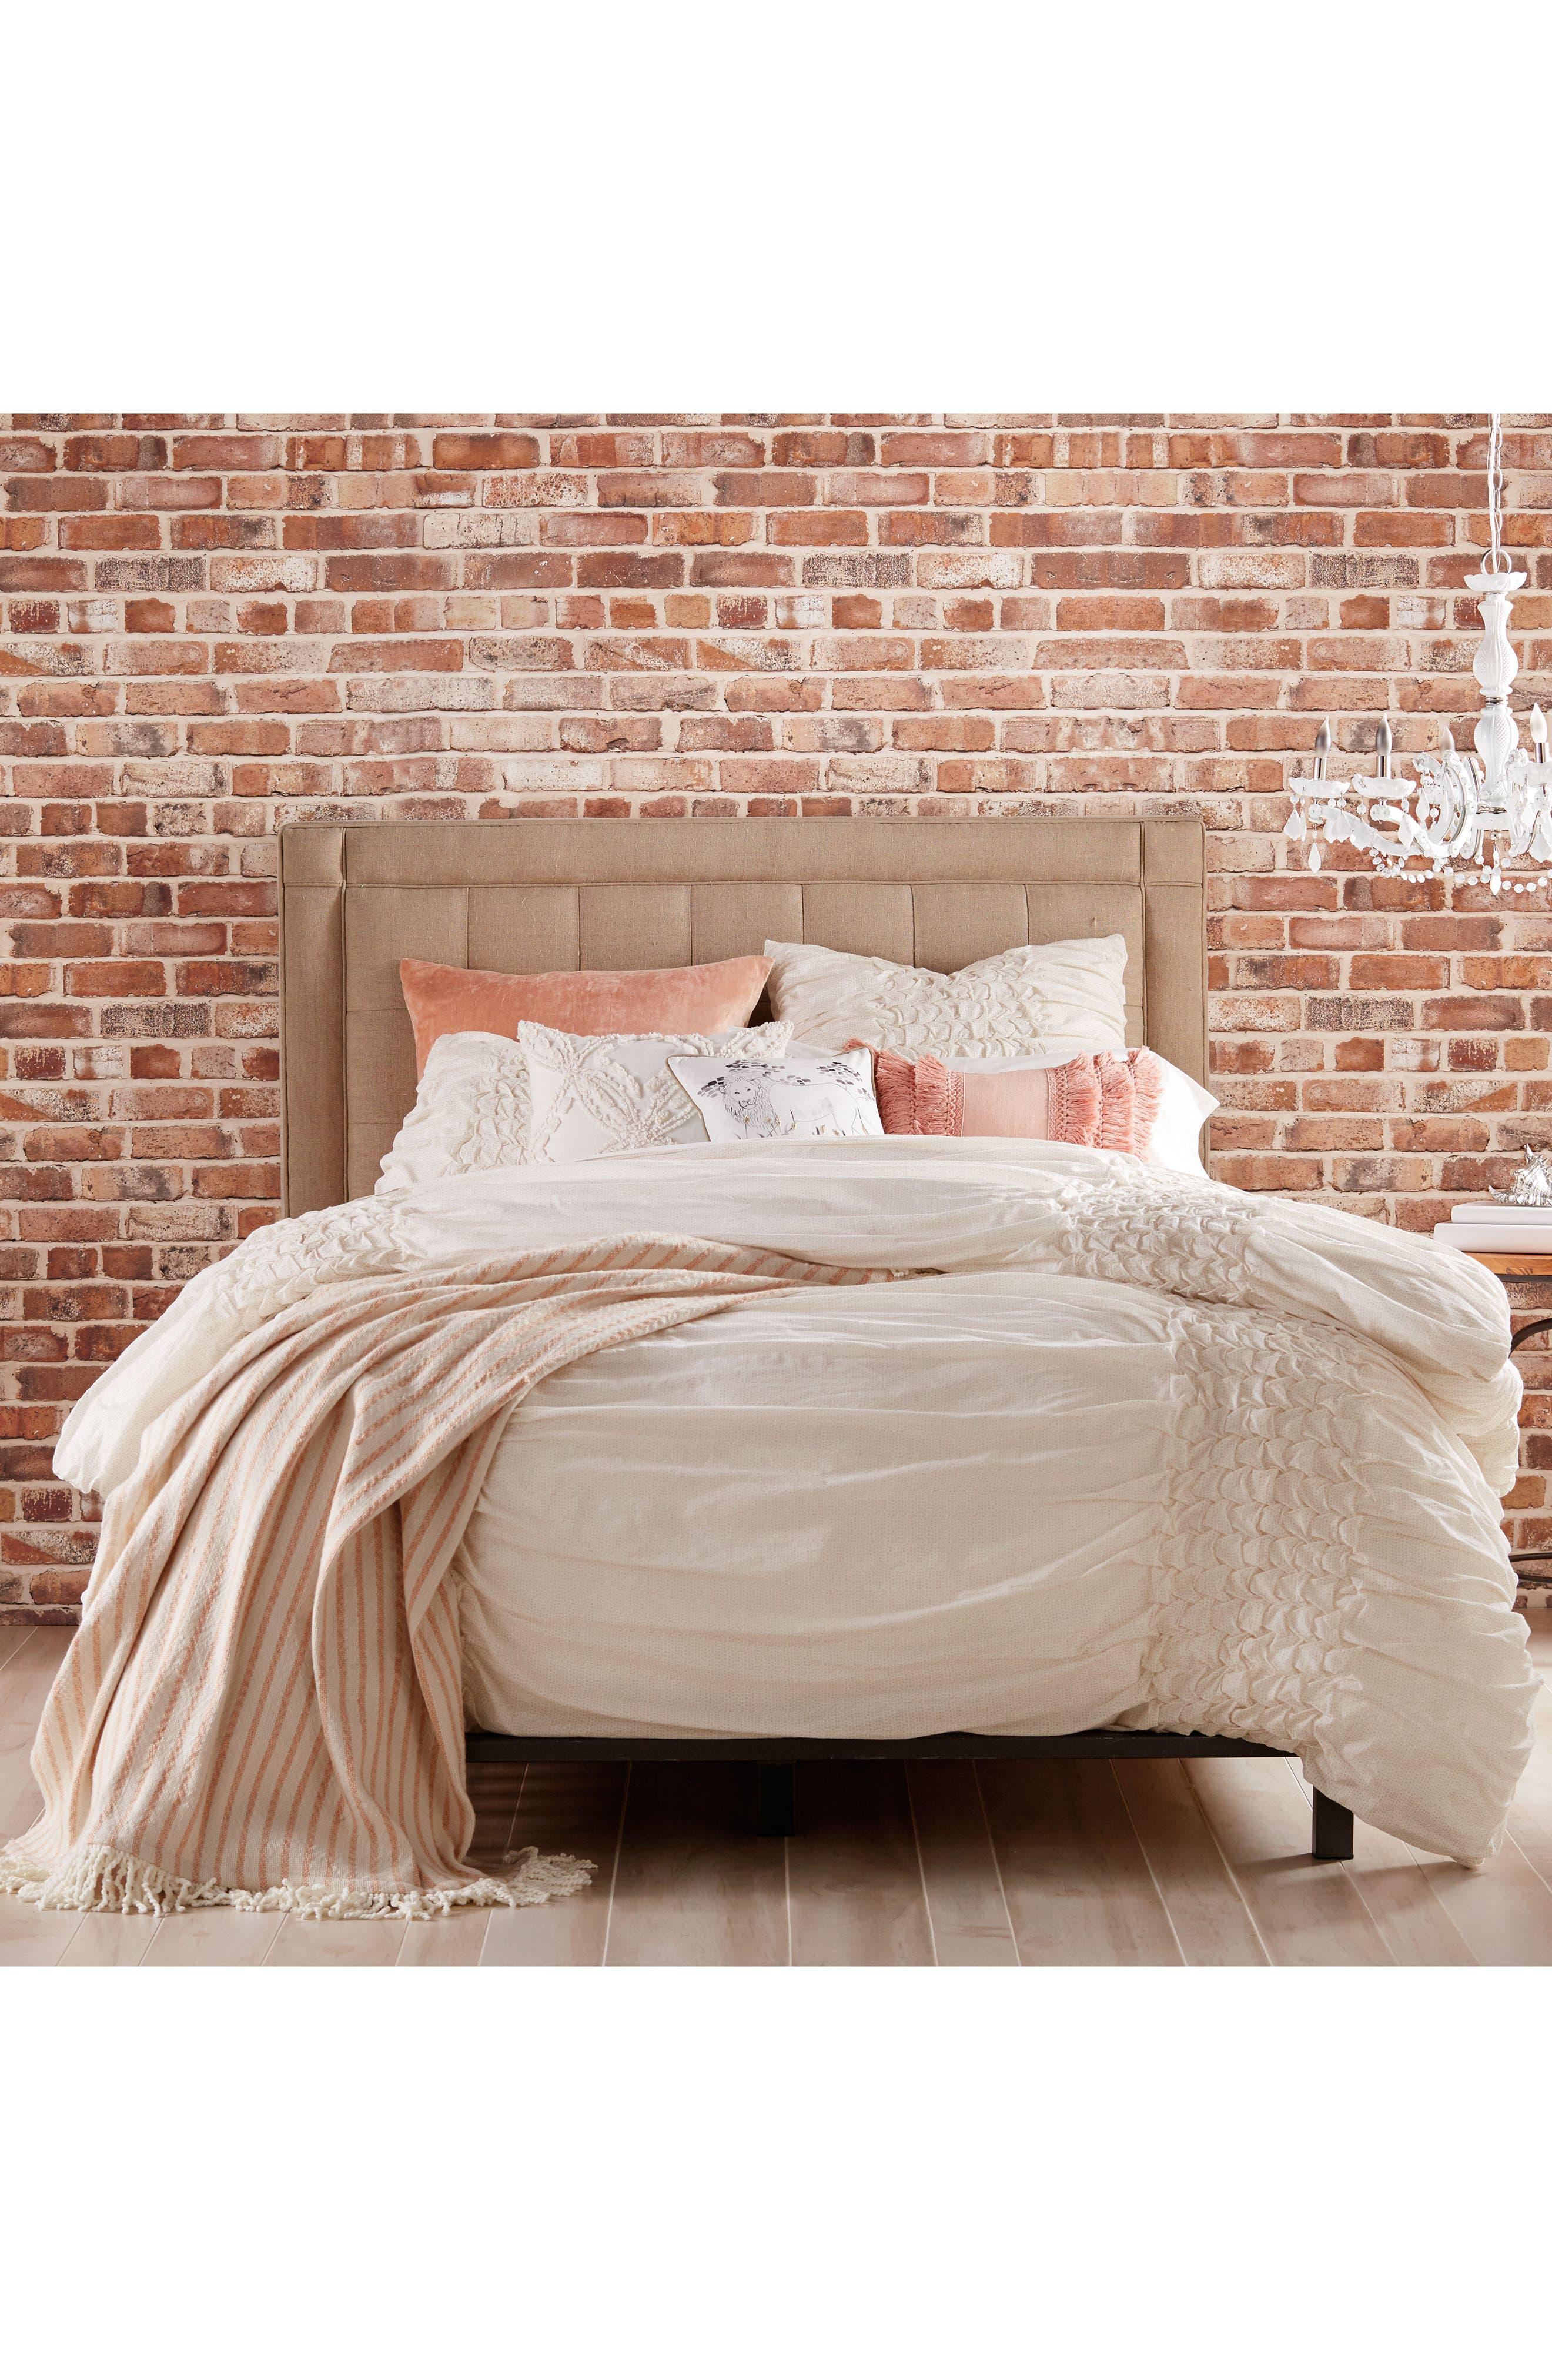 Peri Home Triangle Braid Comforter & Sham Set